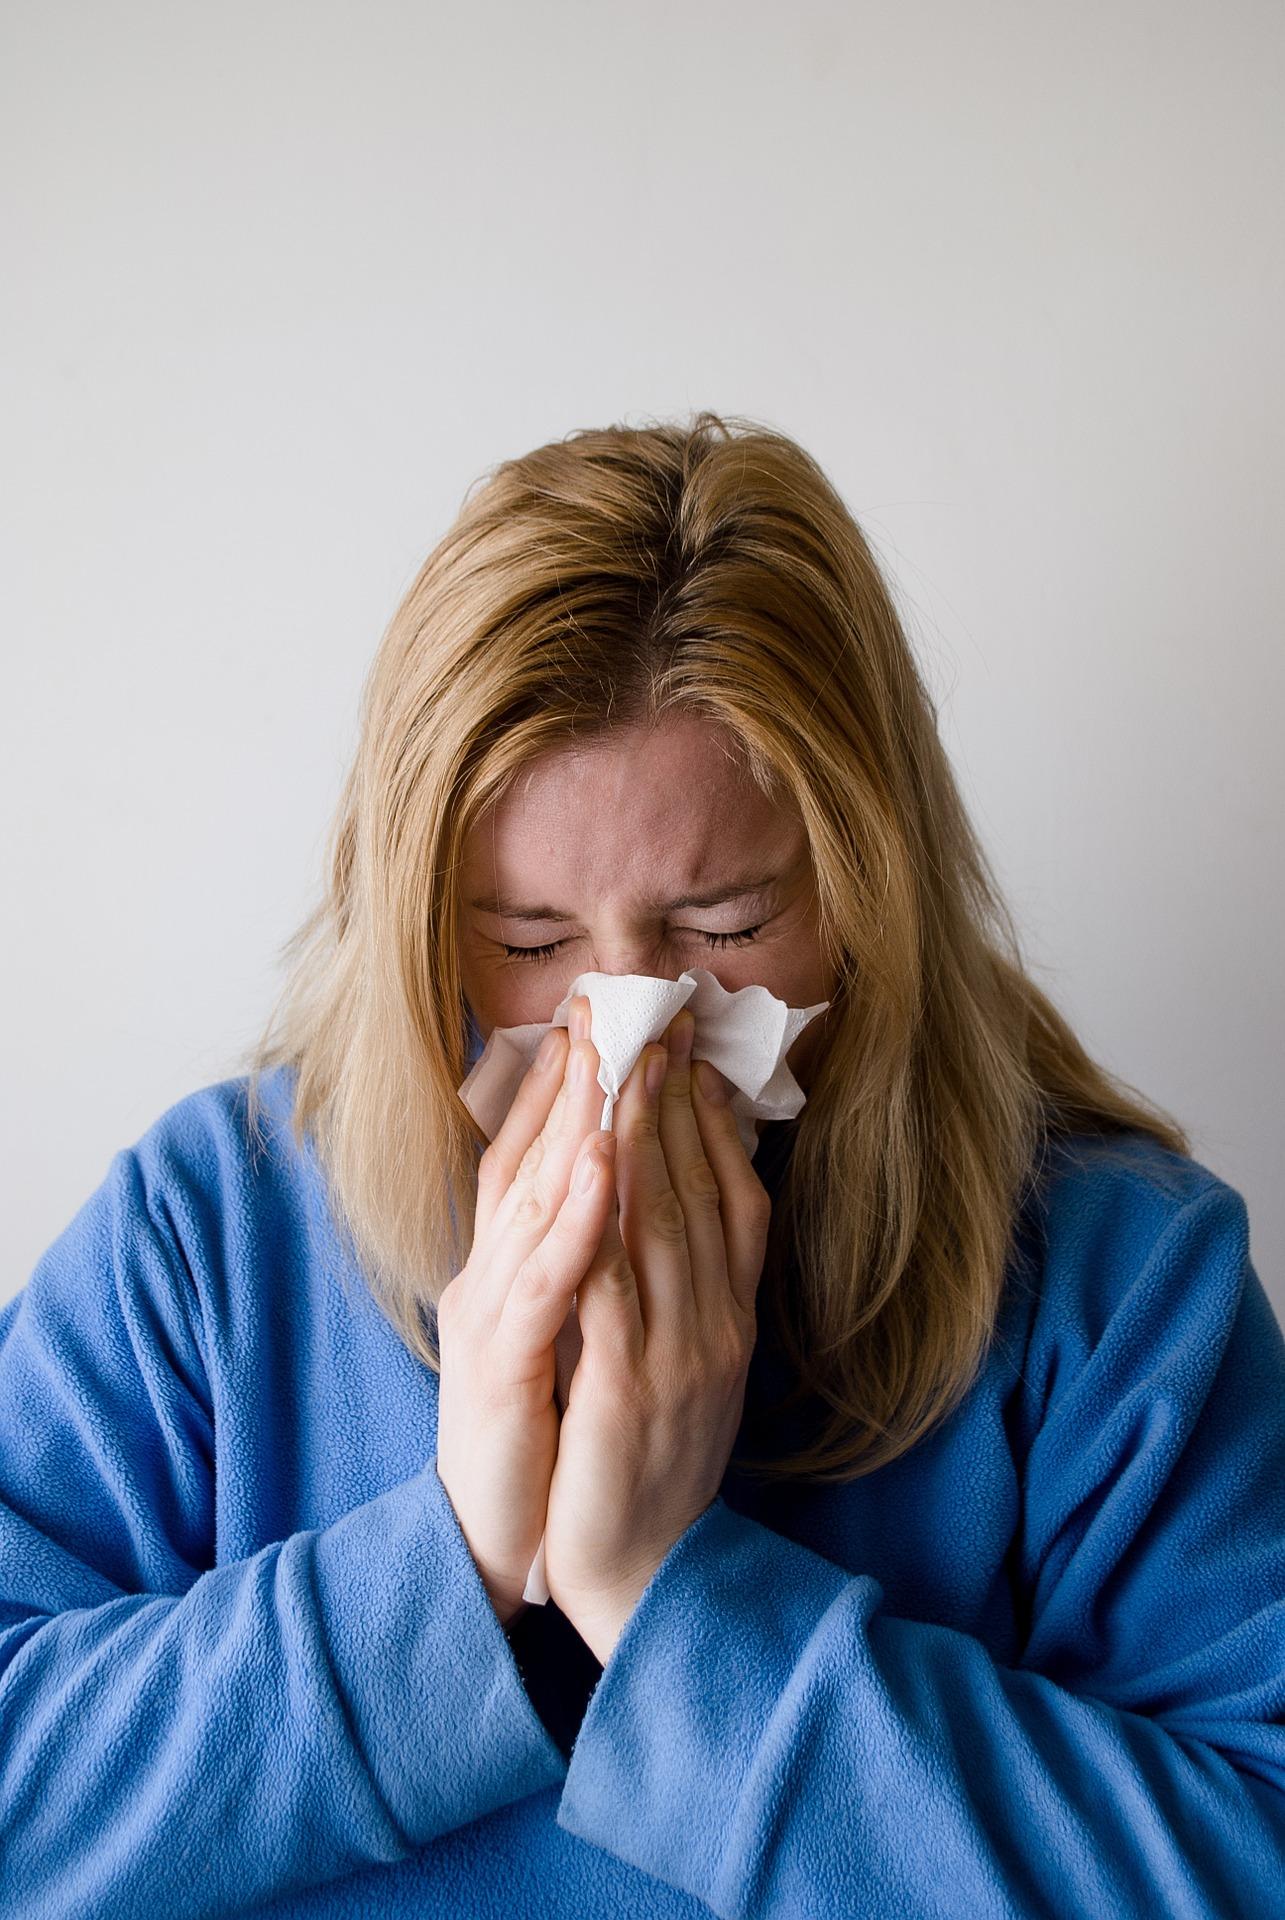 Entrar e sair de lugares com ar-condicionado pode abalar a imunidade?